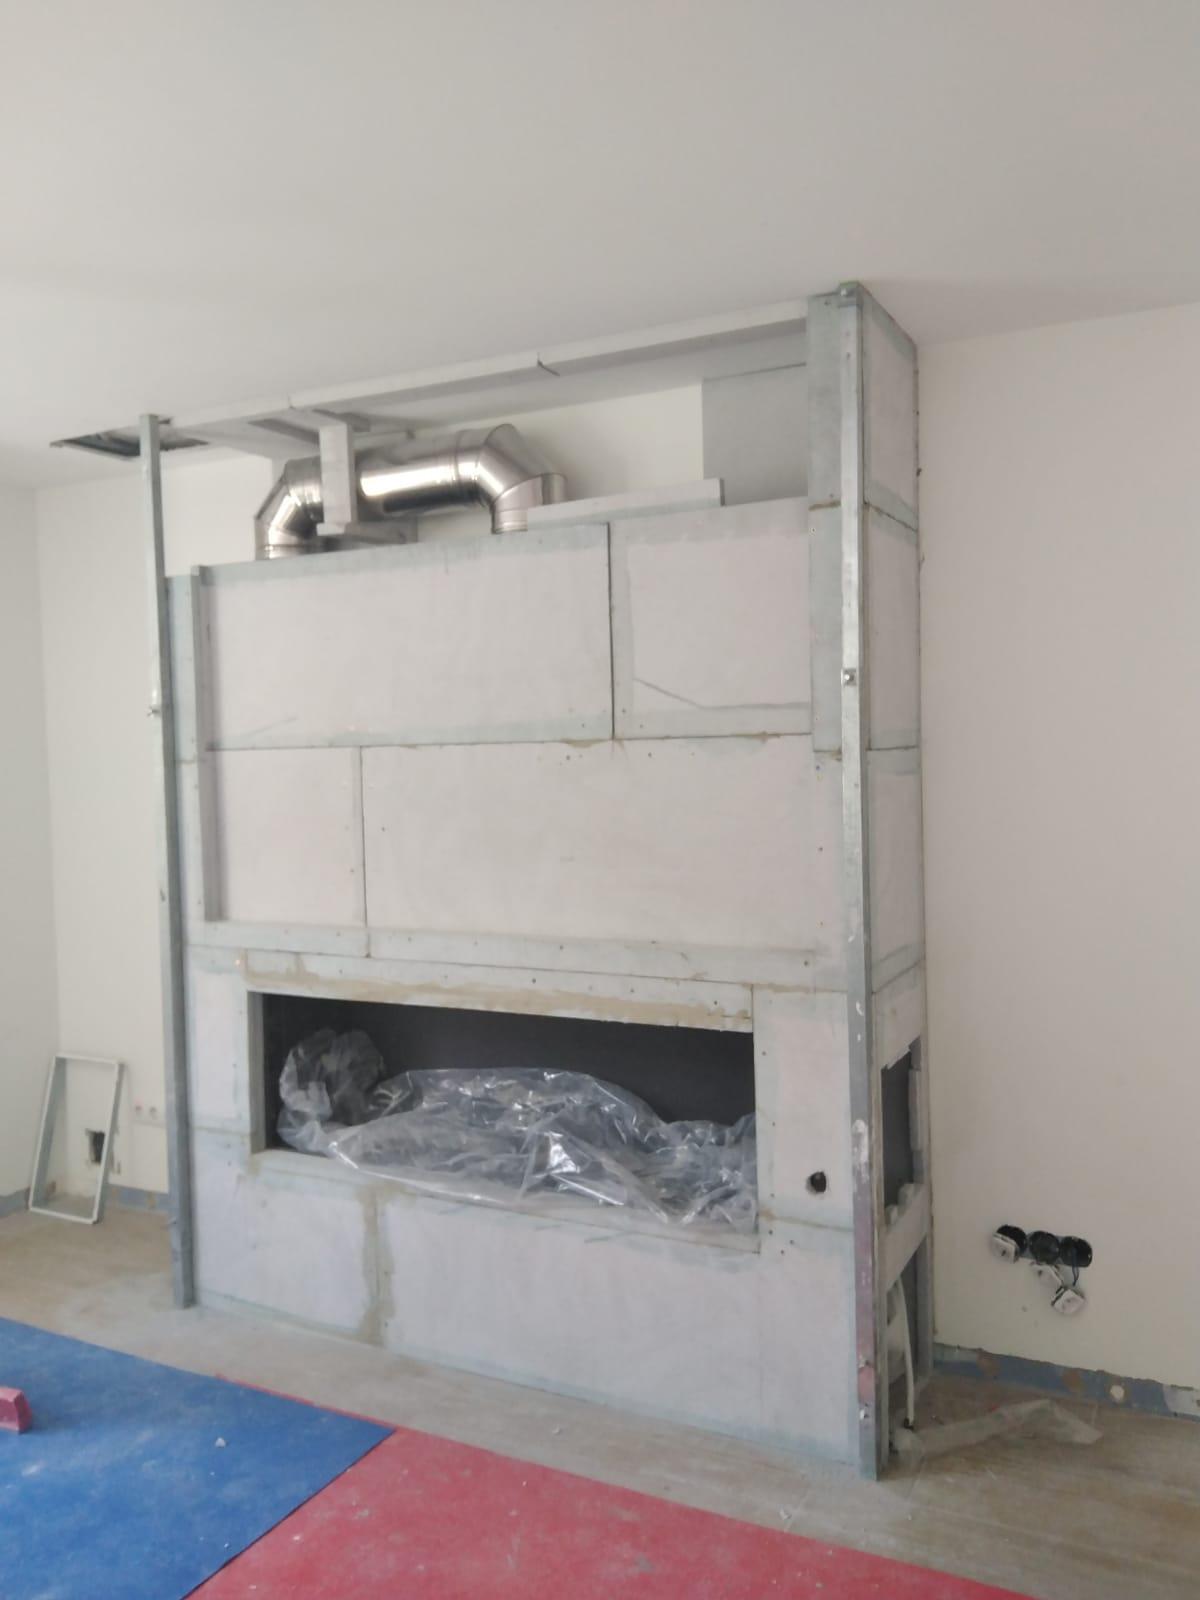 proceso de instalacion paneles de silicato de calcio